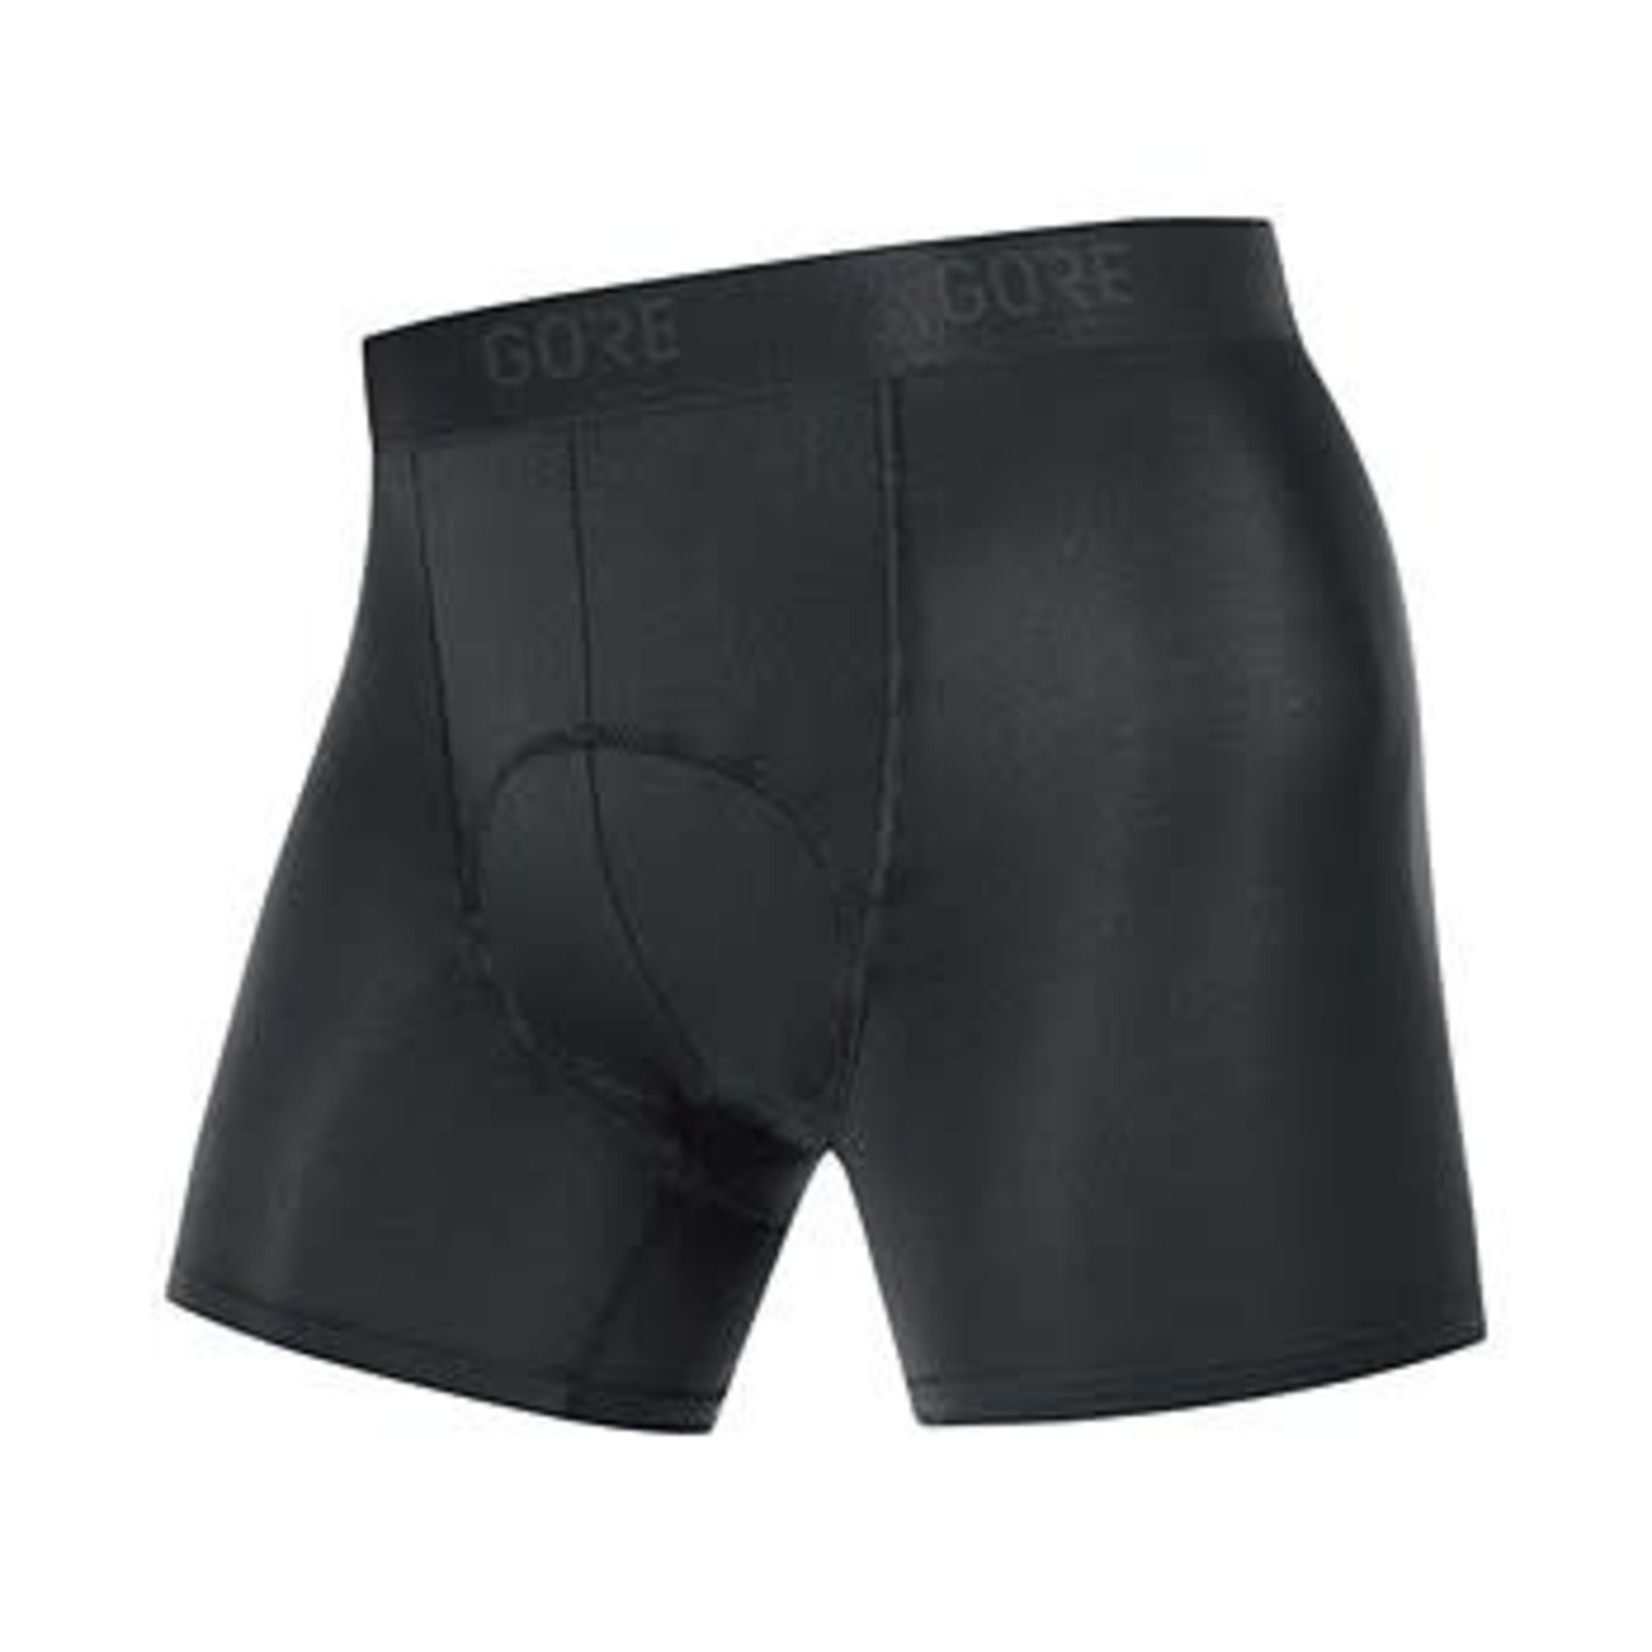 GORE Wear GORE WINDSTOPPER BL Boxer Shorts